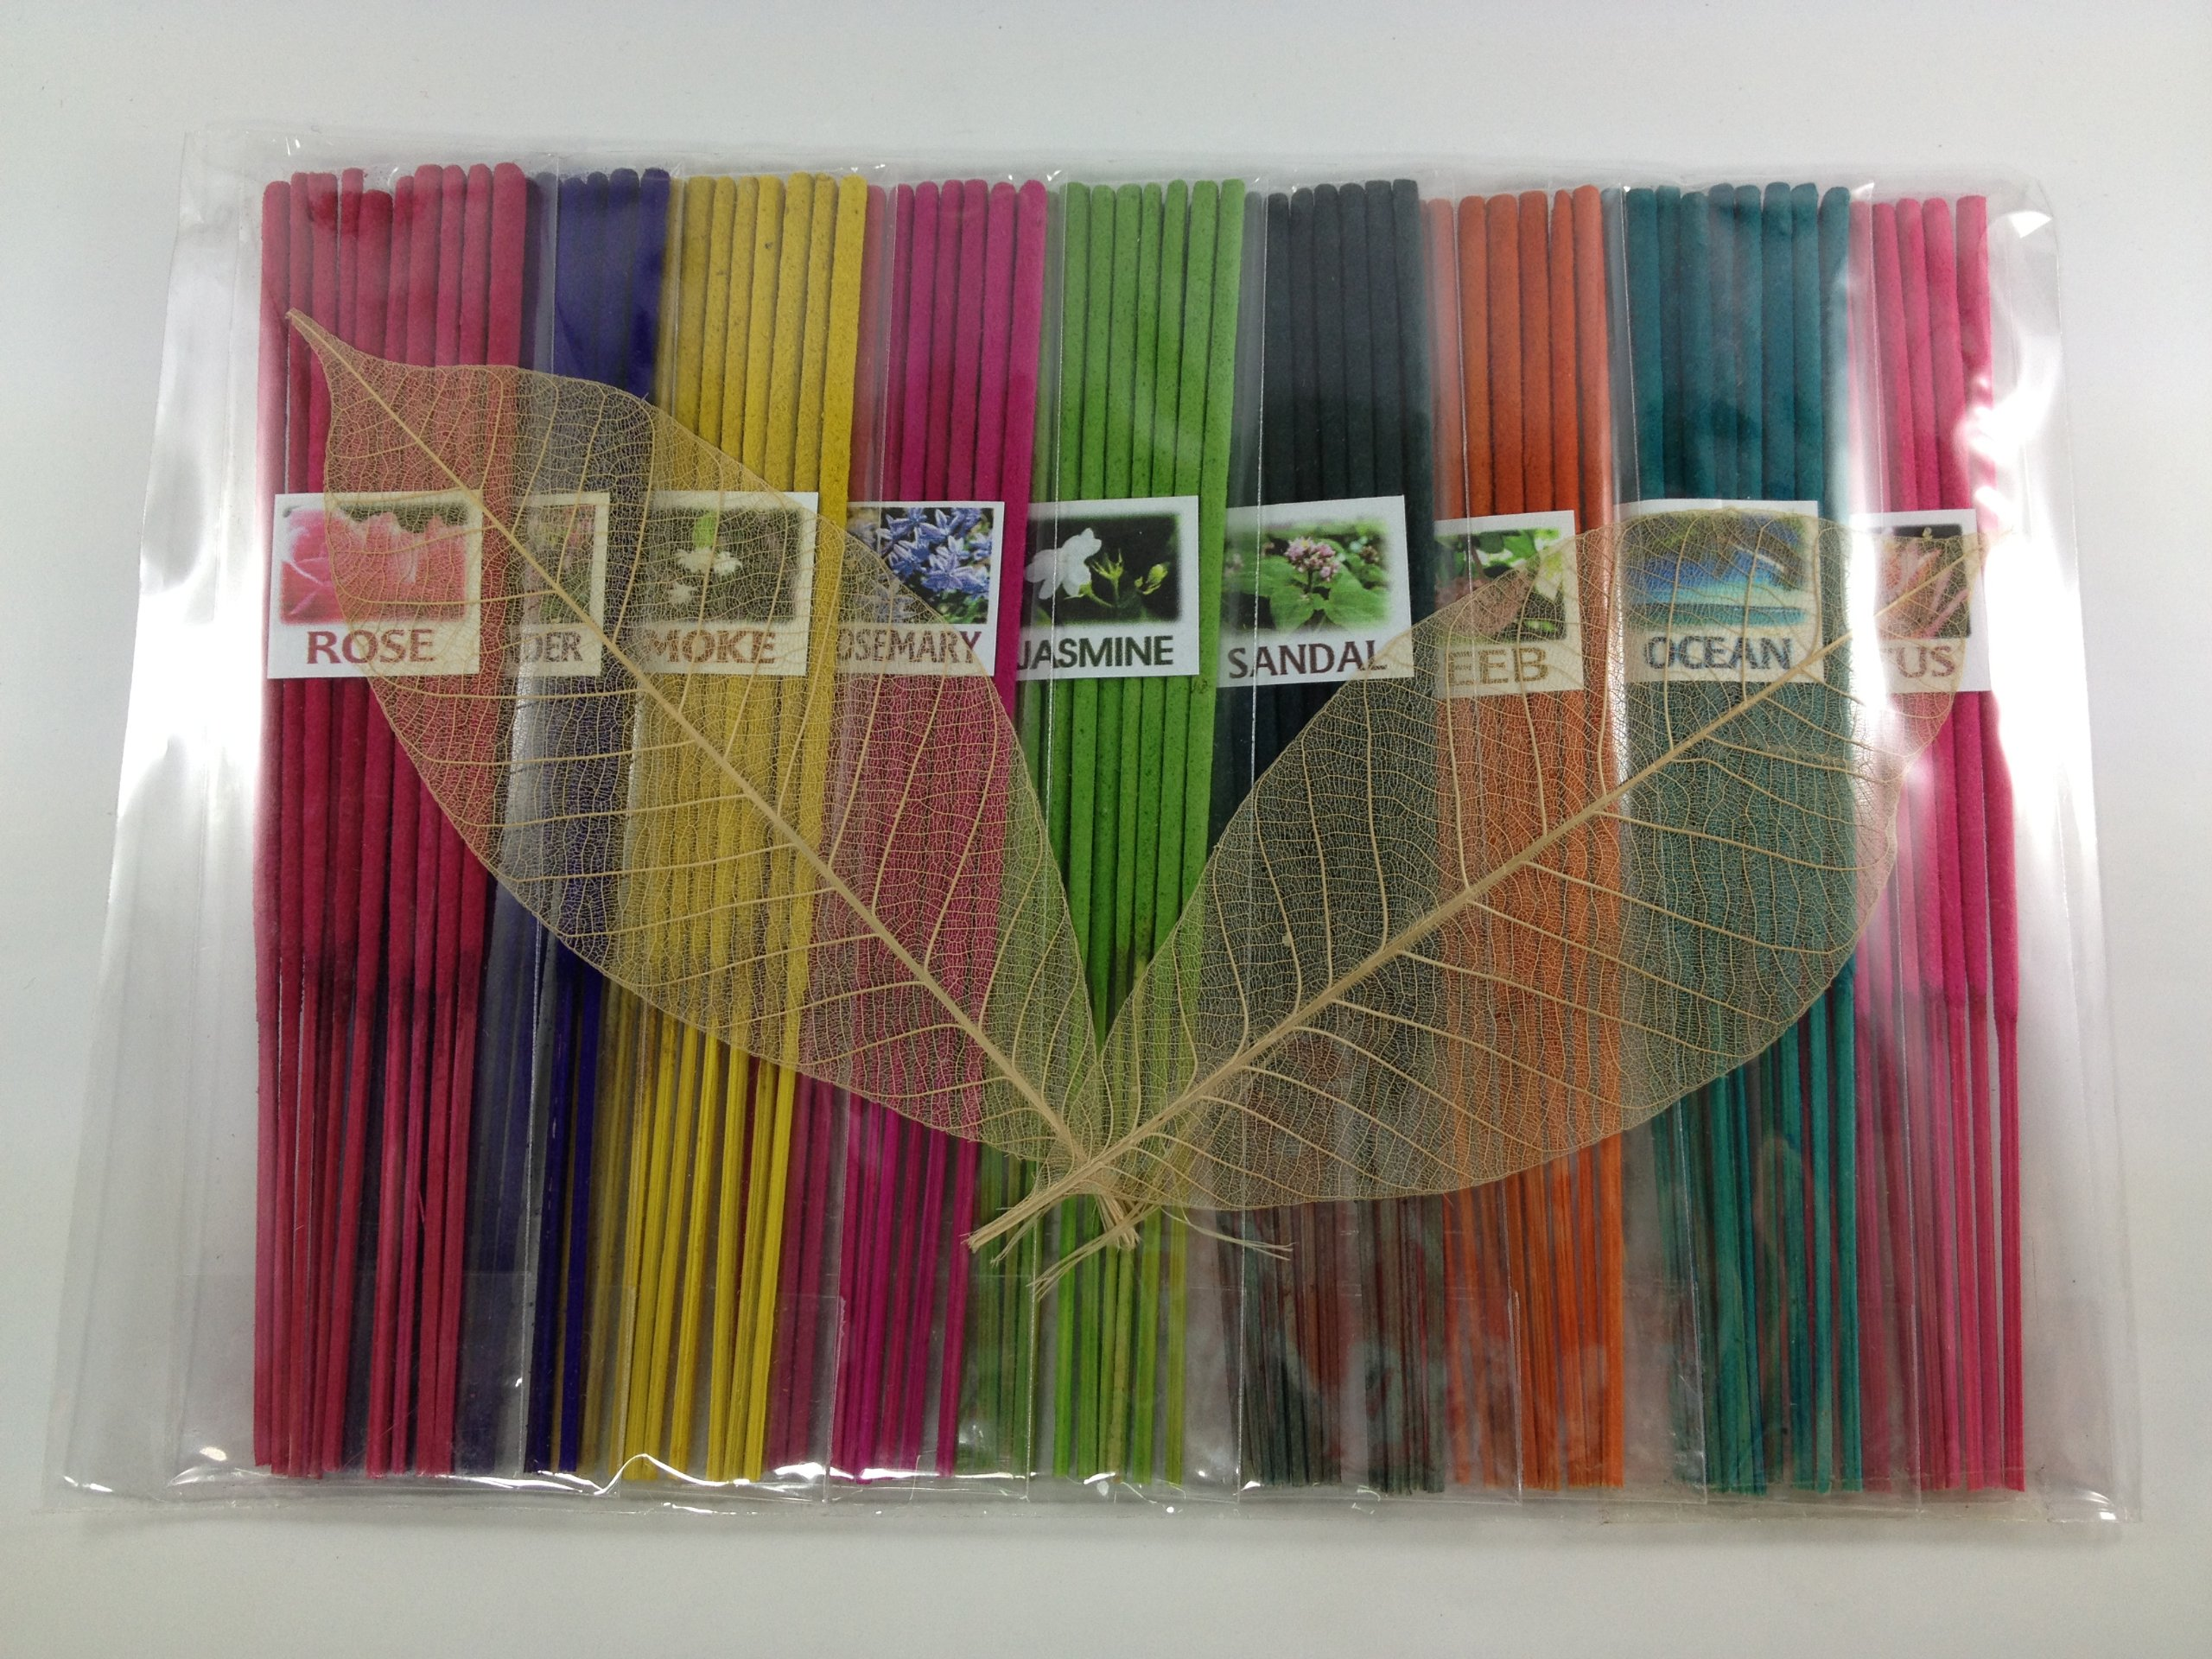 Thai Incense Sticks with 9 Aroma Smell - Moke Rosemary Jasmine Sandal Lotus Ocean Rose Lavender Peeb